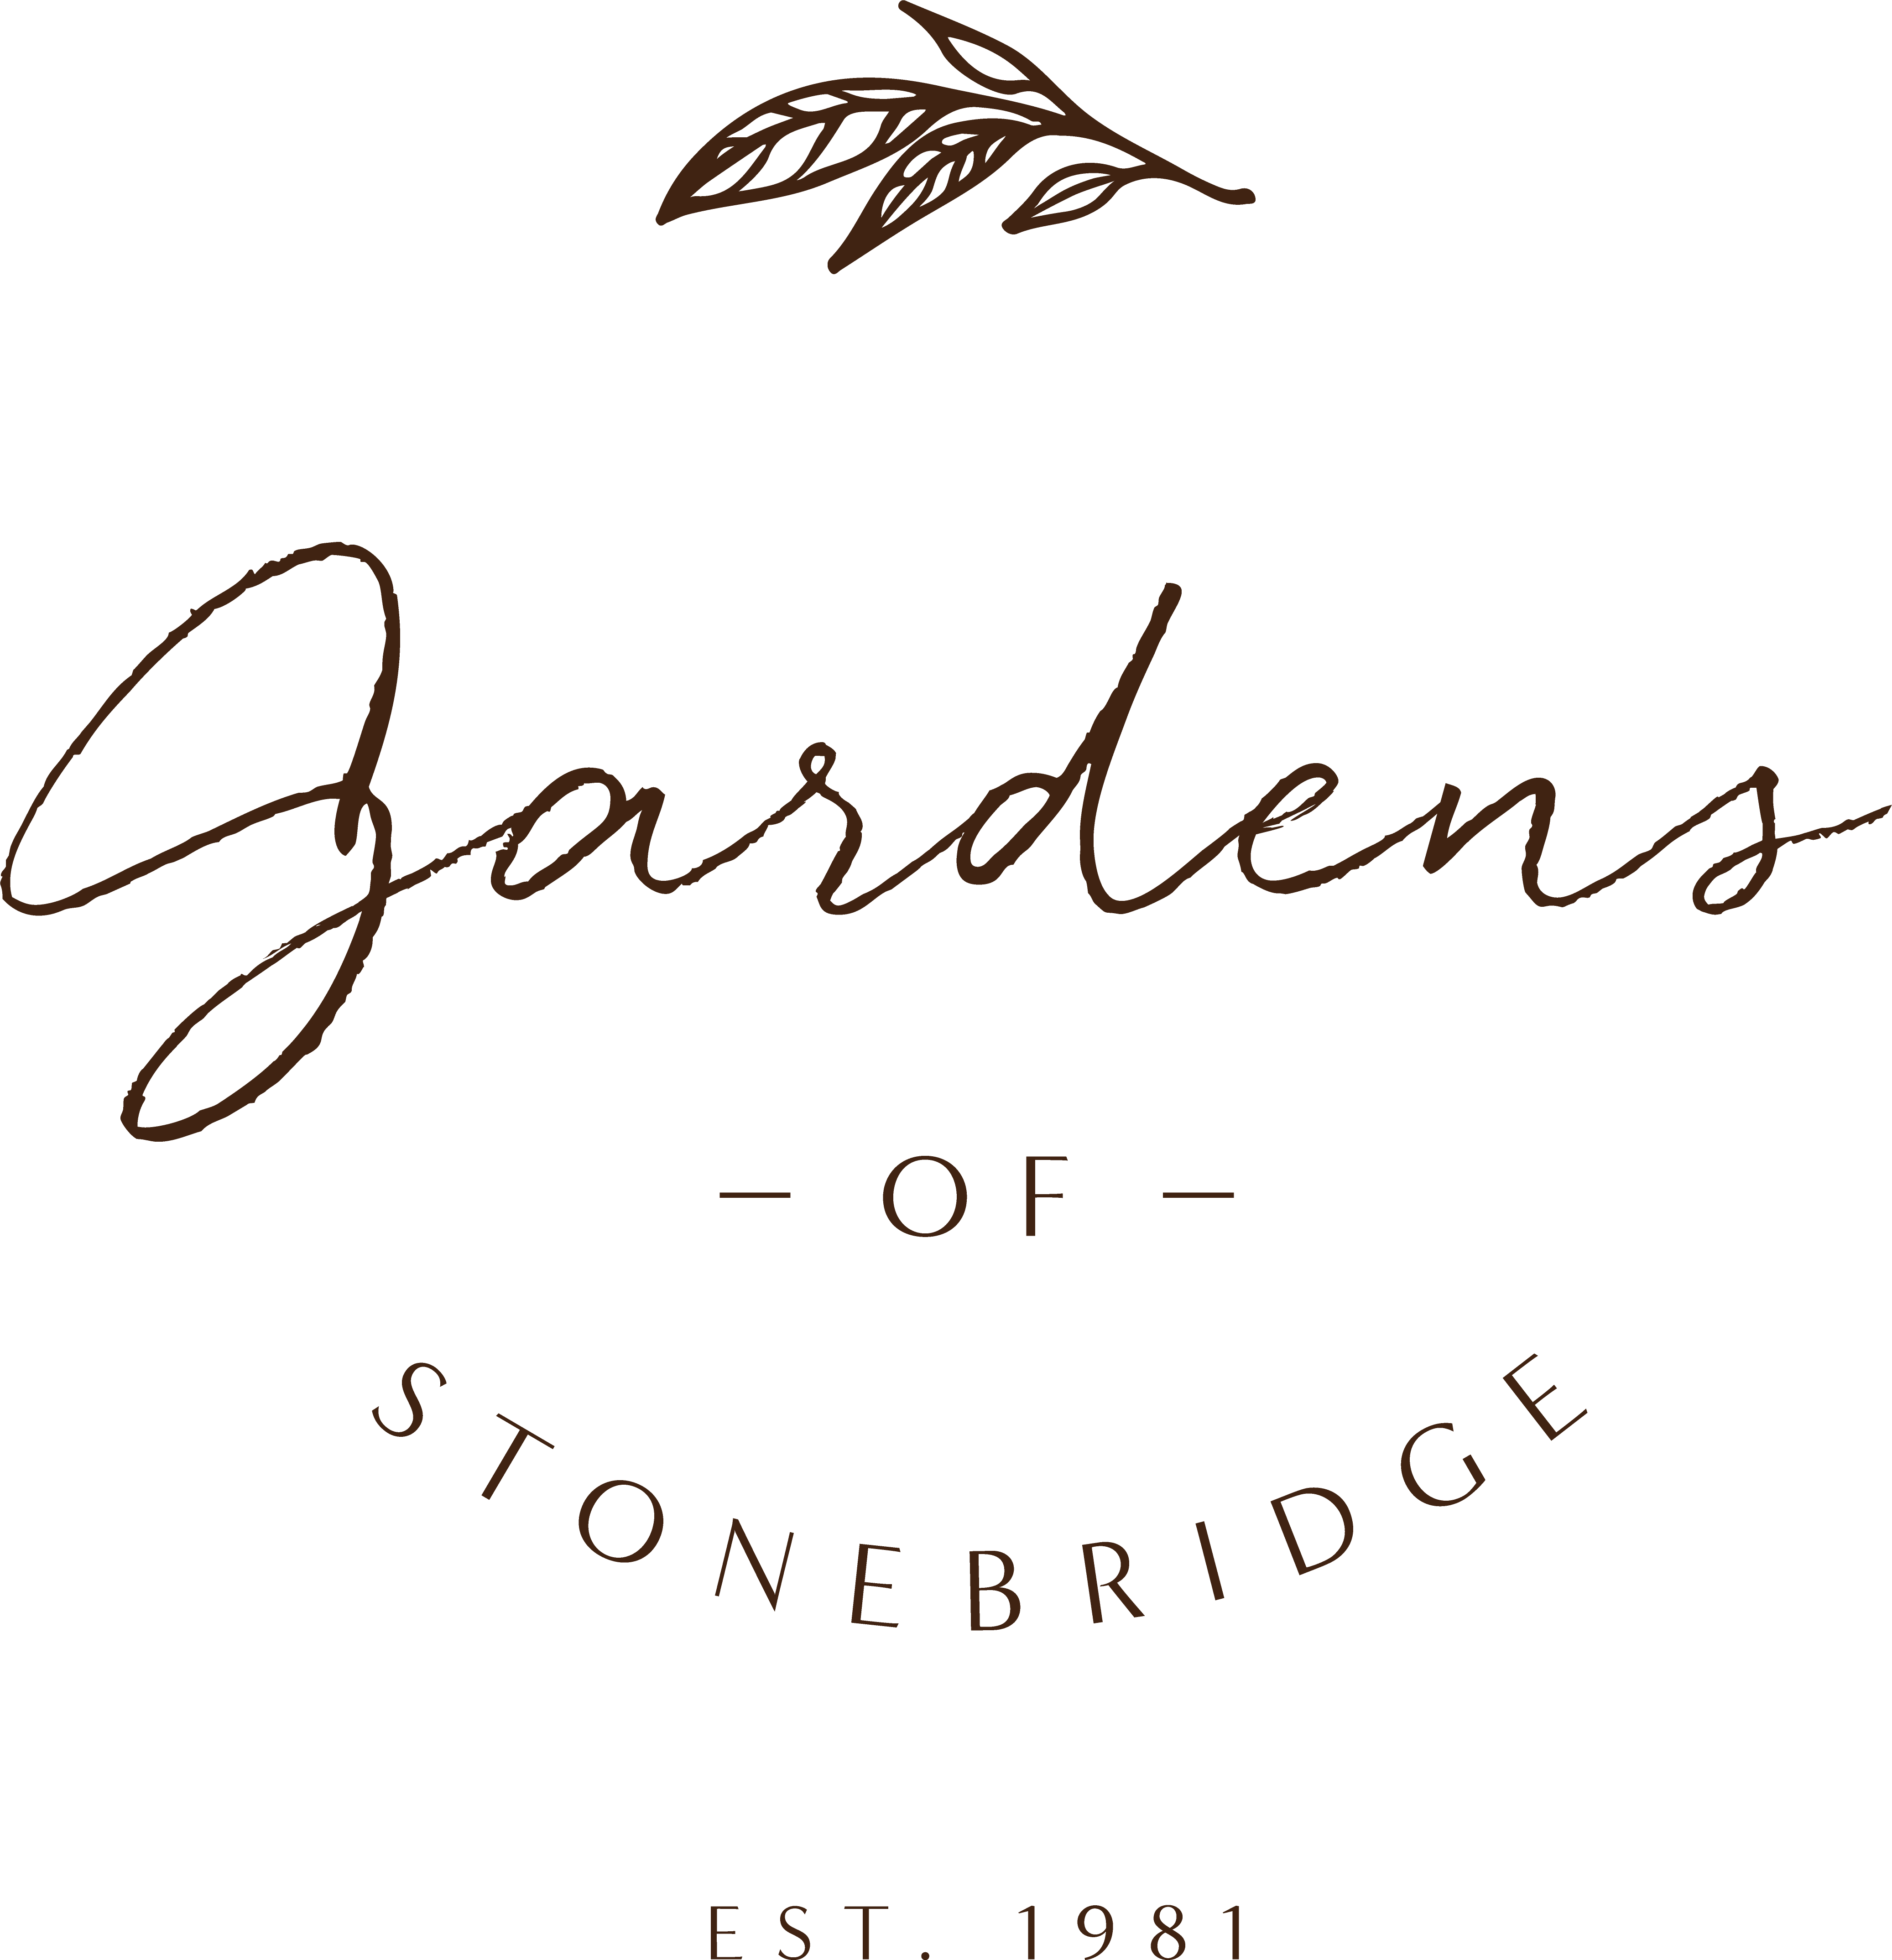 the logo of gardens of stonebridge